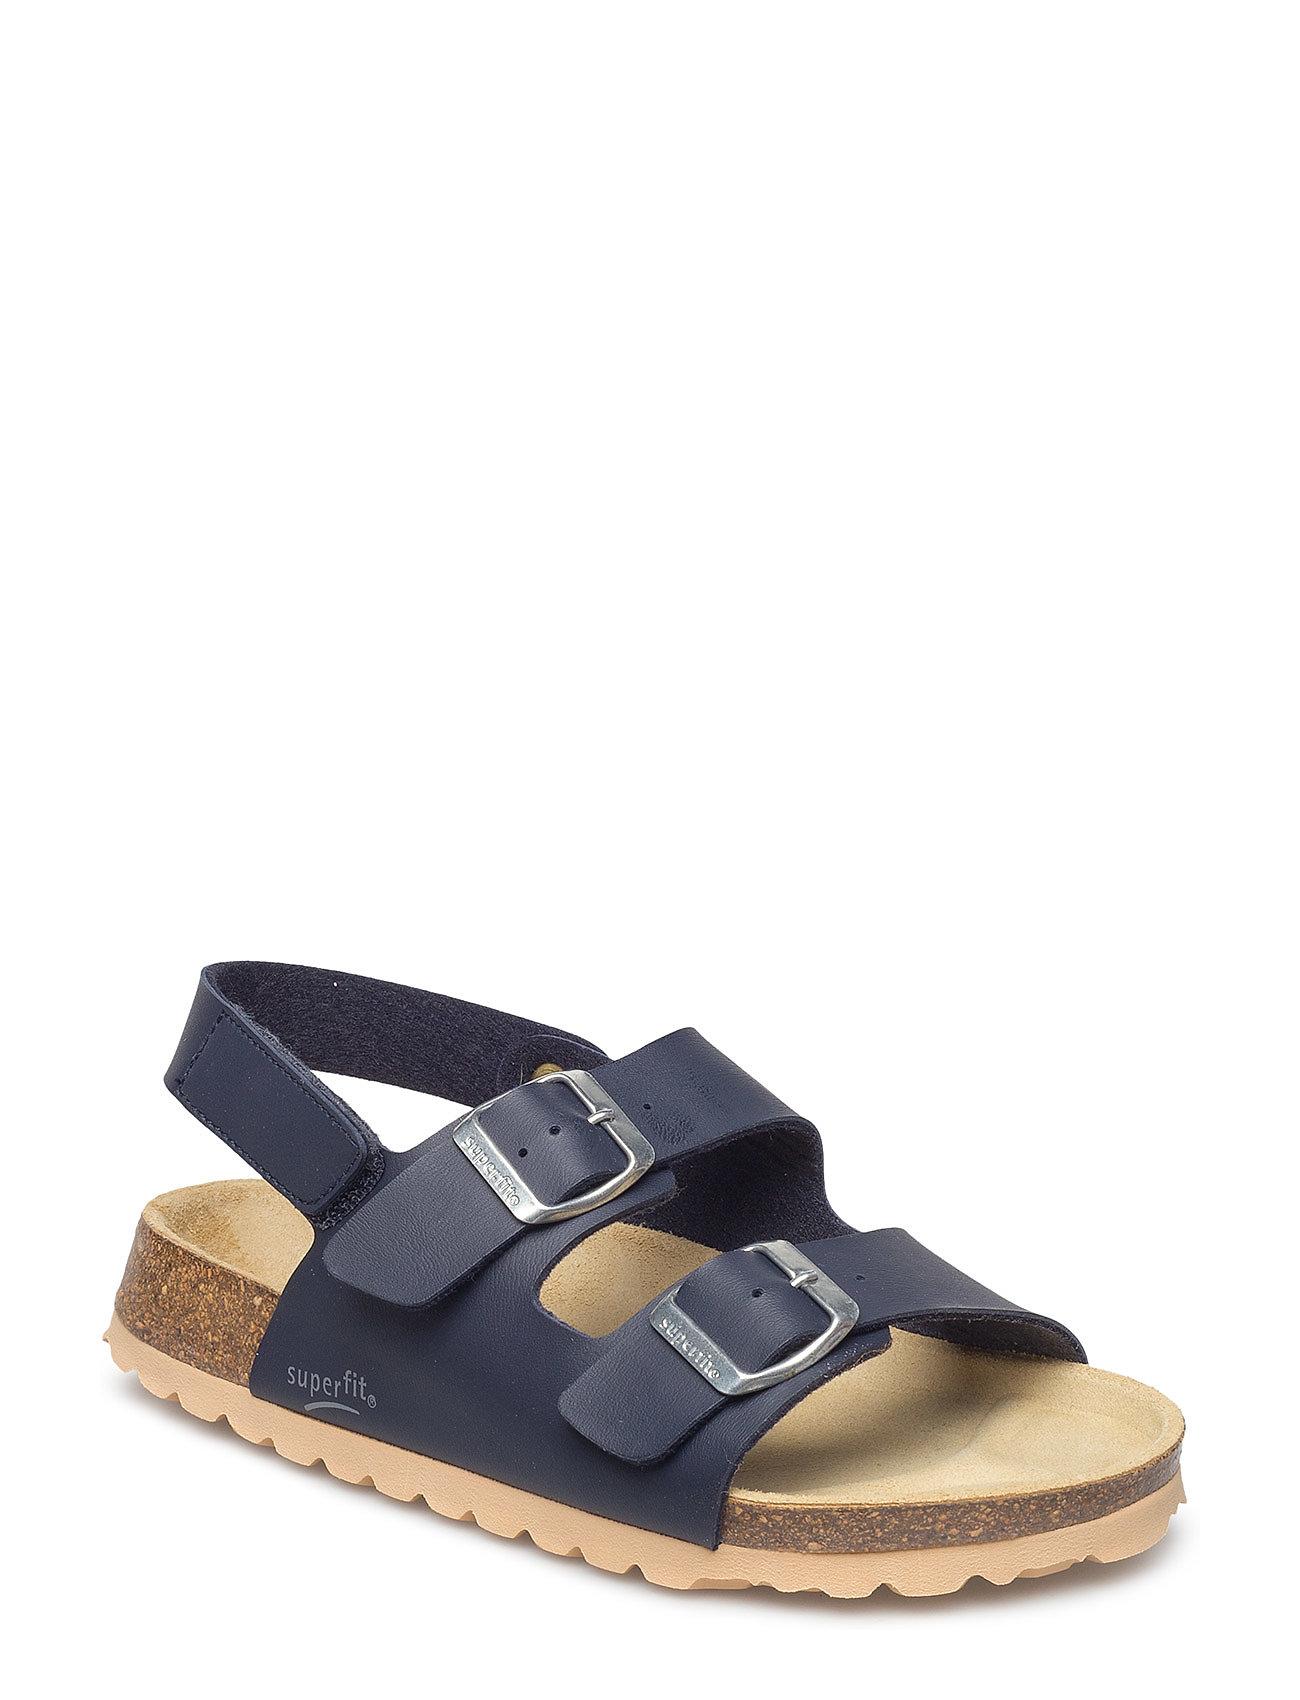 7601bc5517c7 OCEAN Superfit Fussbettpantoffel sandaler for børn - Pashion.dk